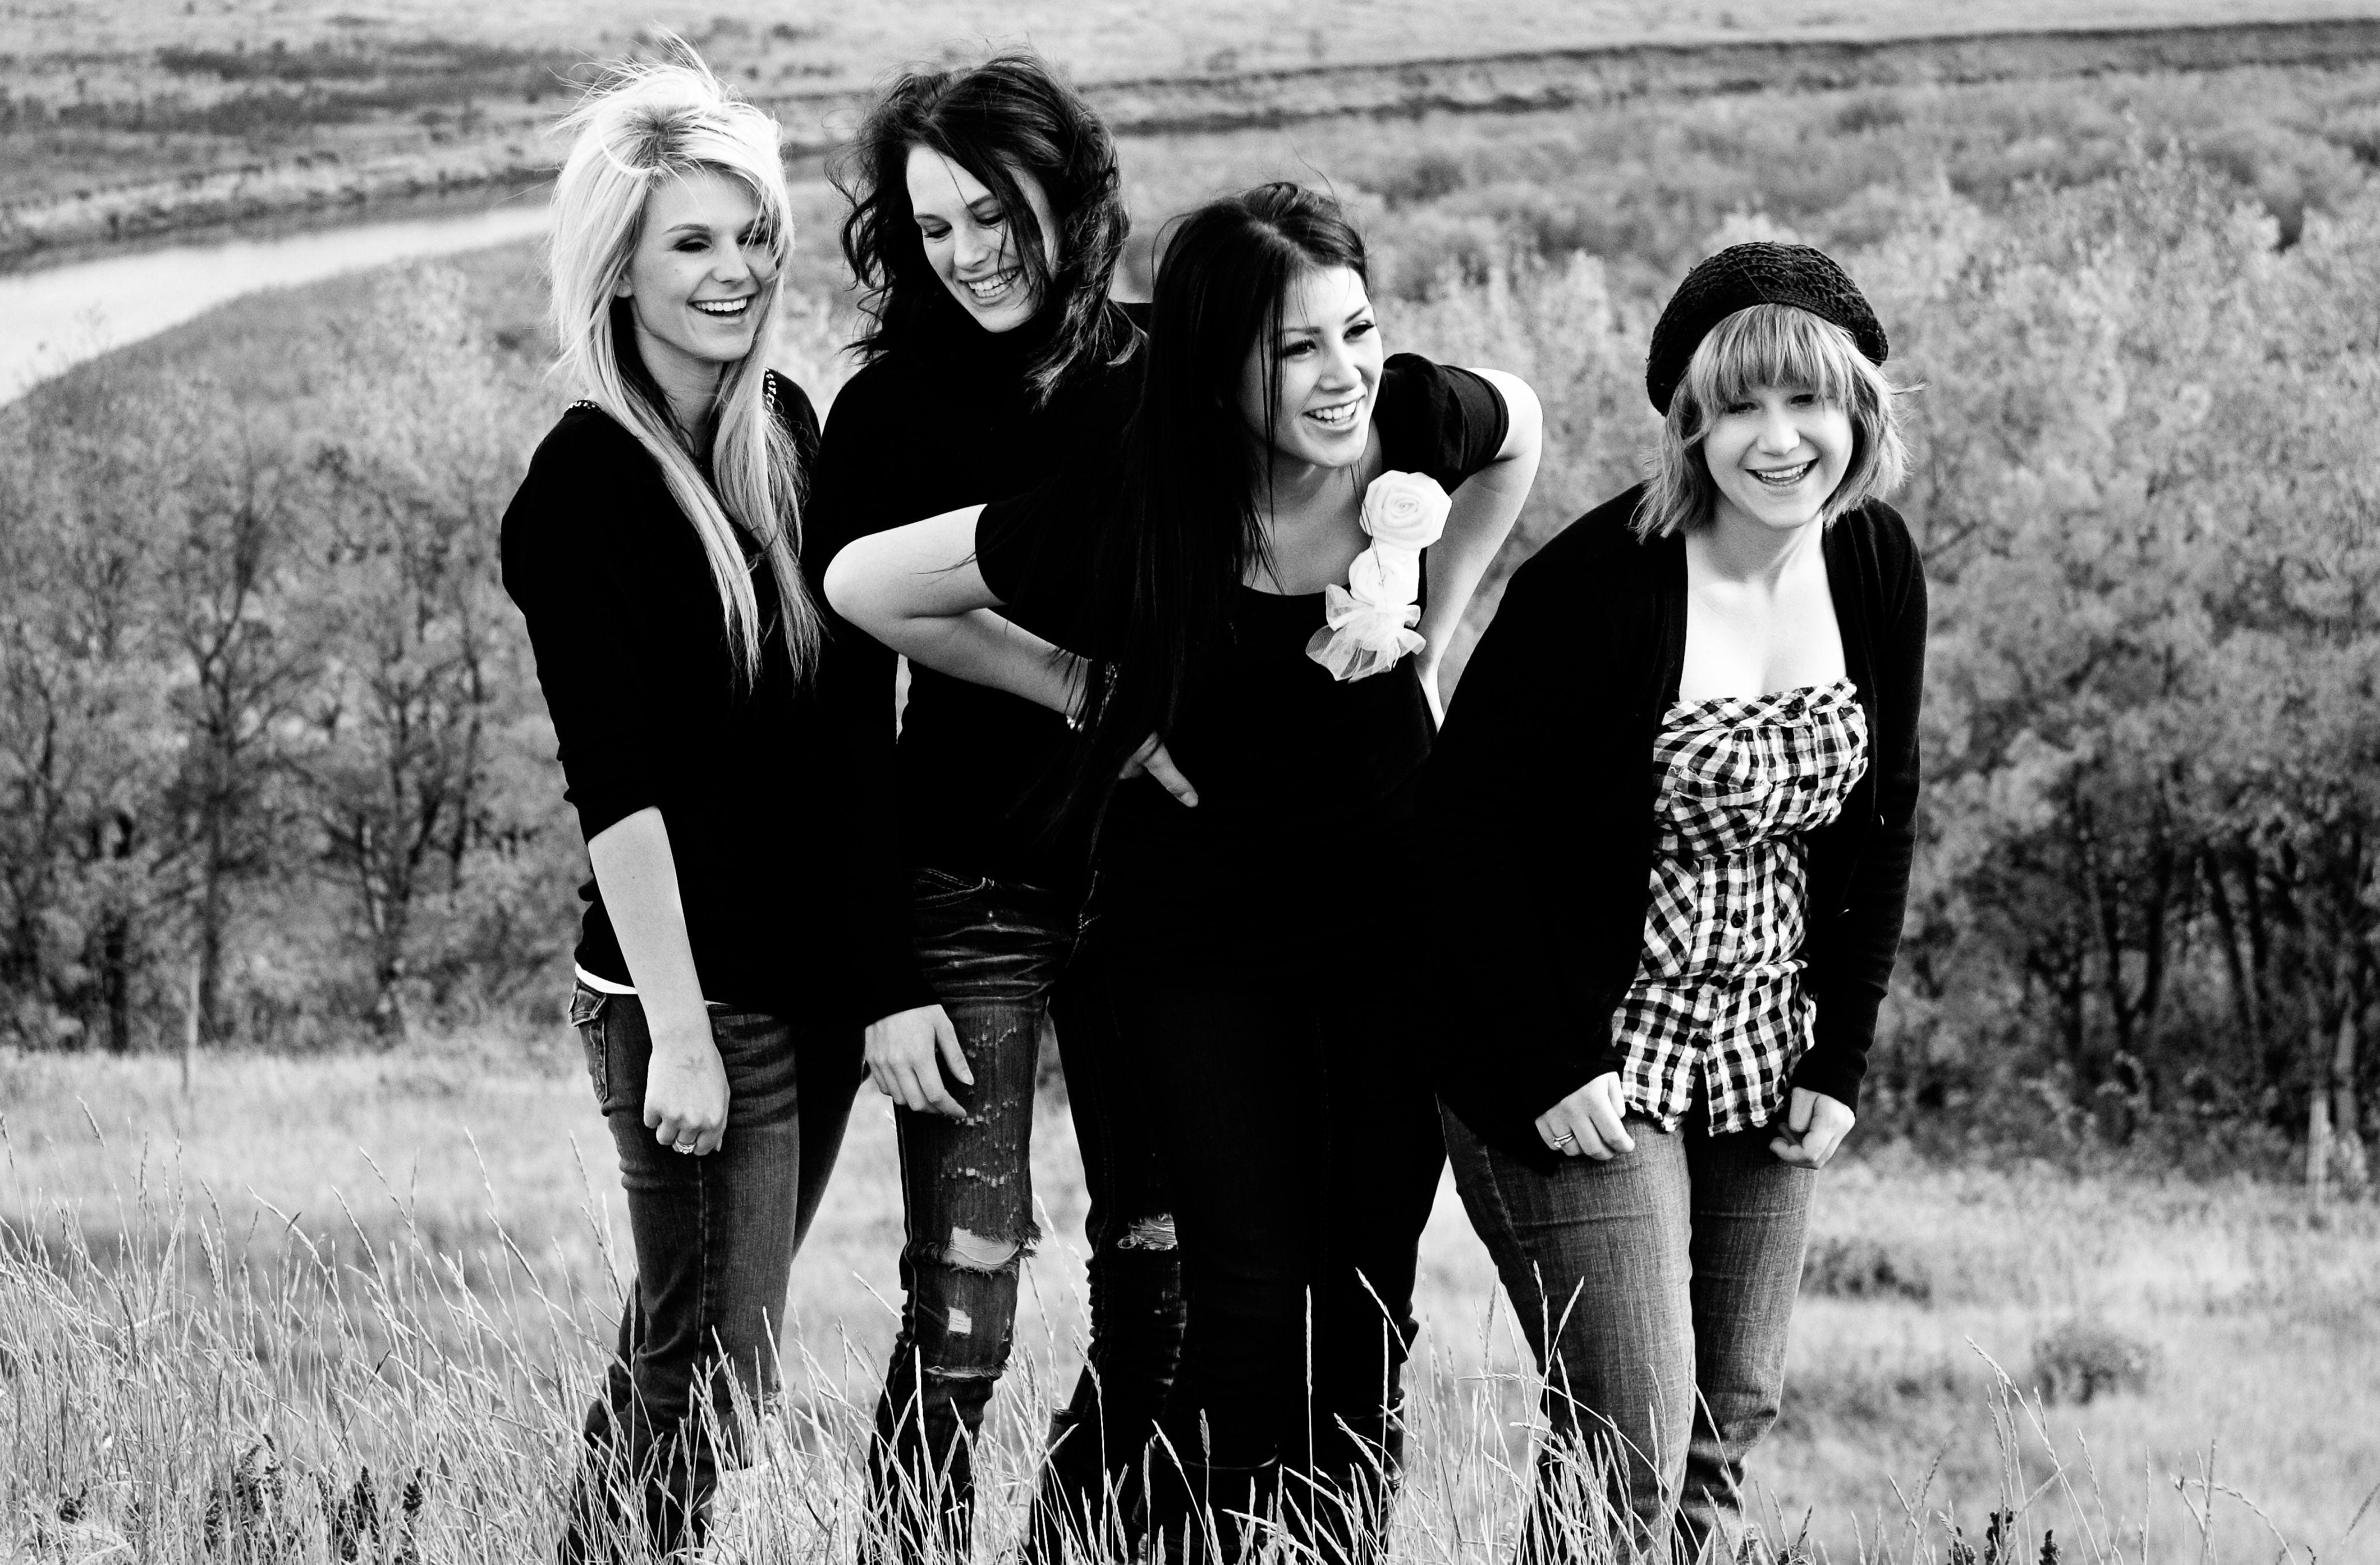 Friends are a girls own medicine